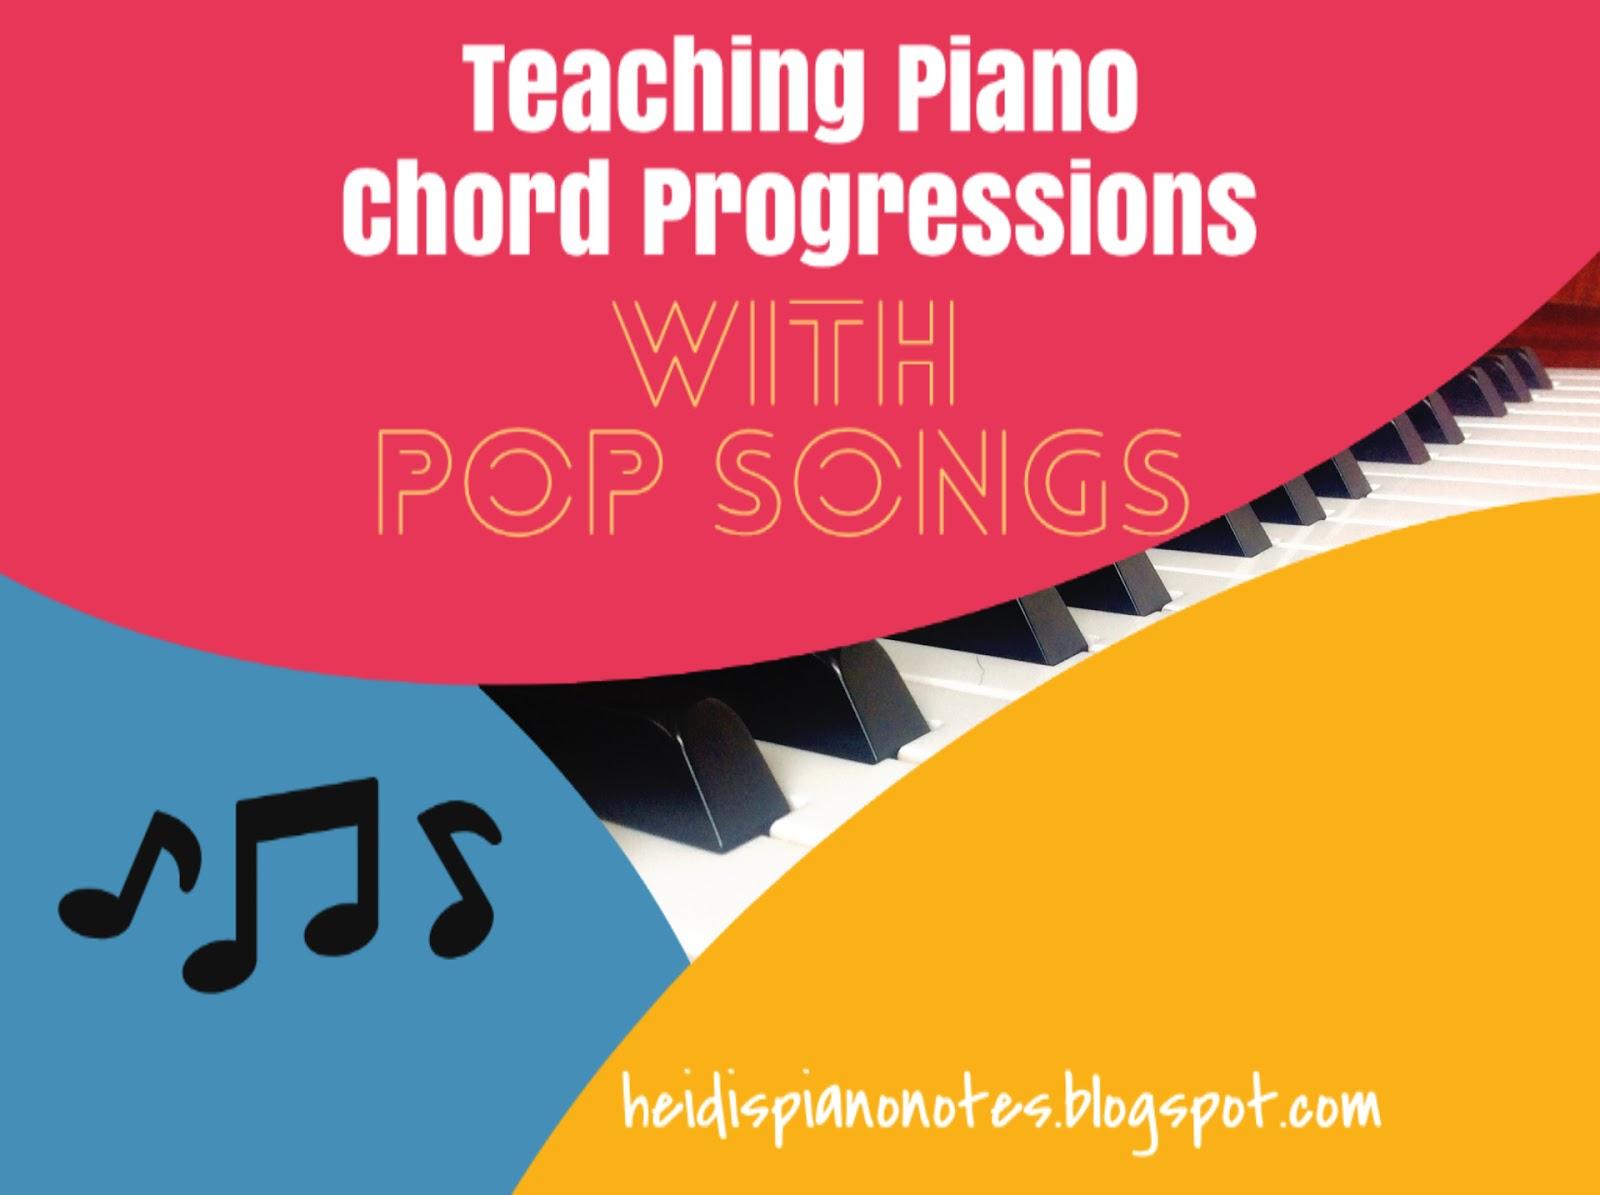 Heidi's Piano Studio: Teaching Piano Chord Progressions with